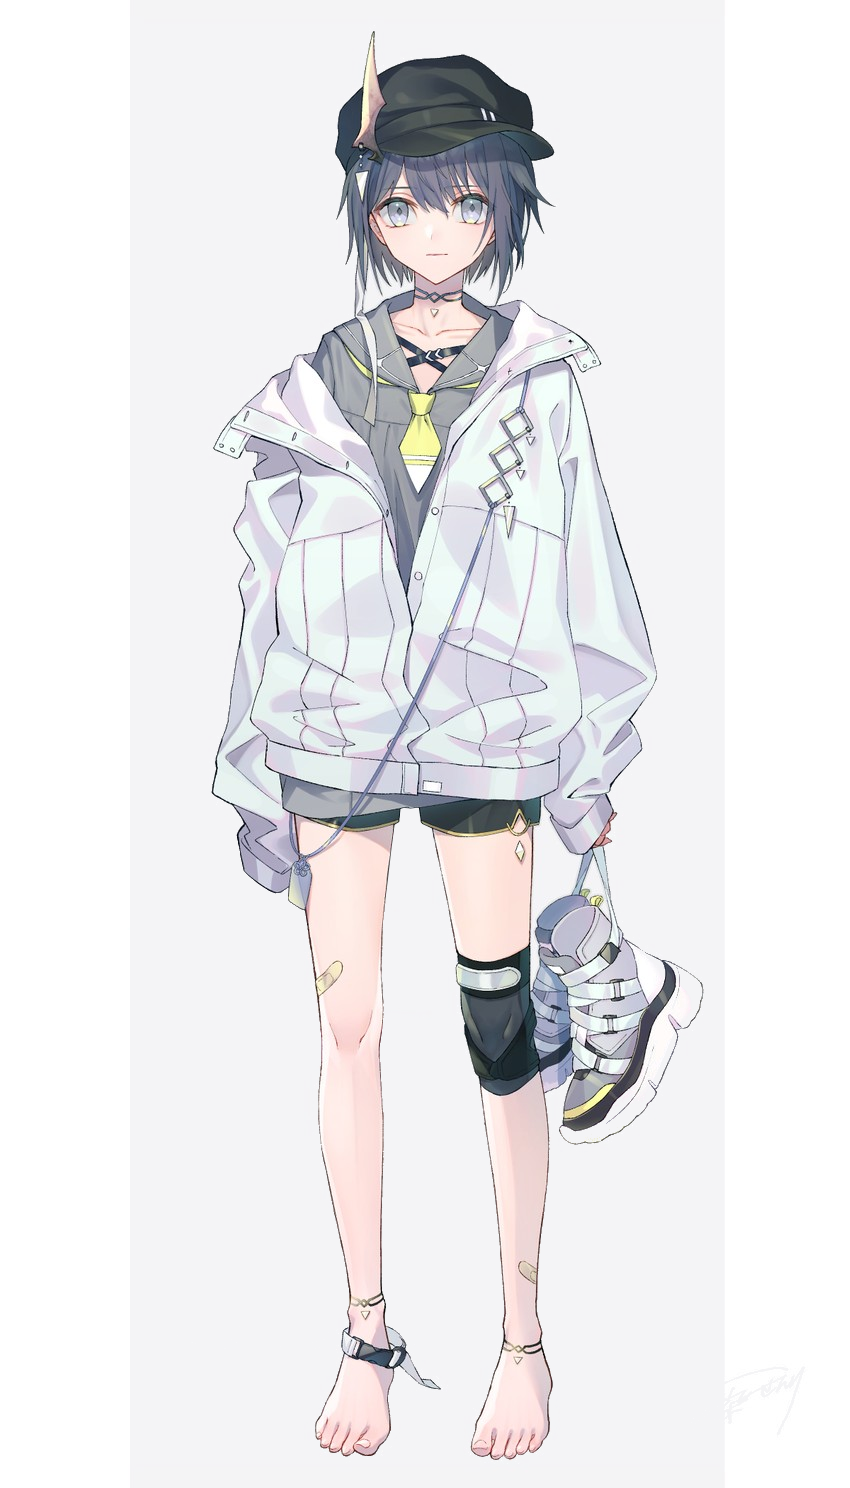 original_drawn_by_haizome_senri__sample-